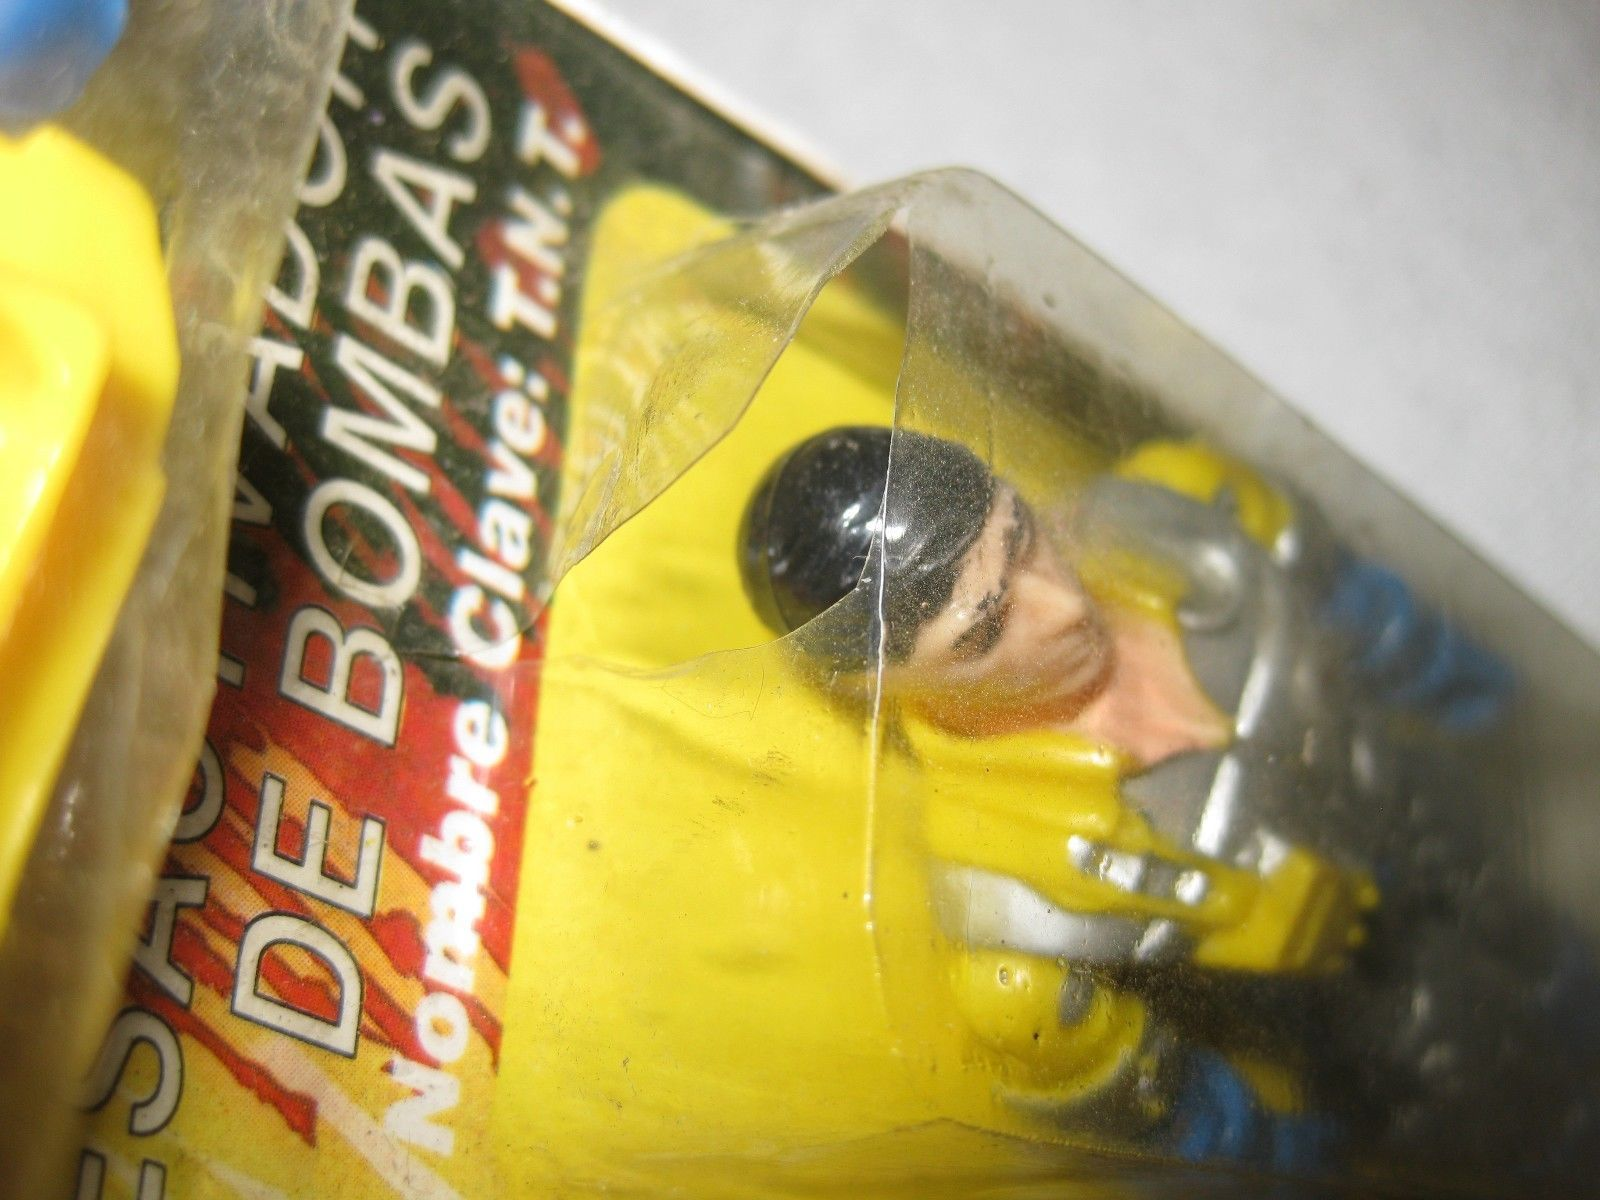 1982 GI JOE Action Figure Plastirama Argentina TNT Desactivador De Bombas READ